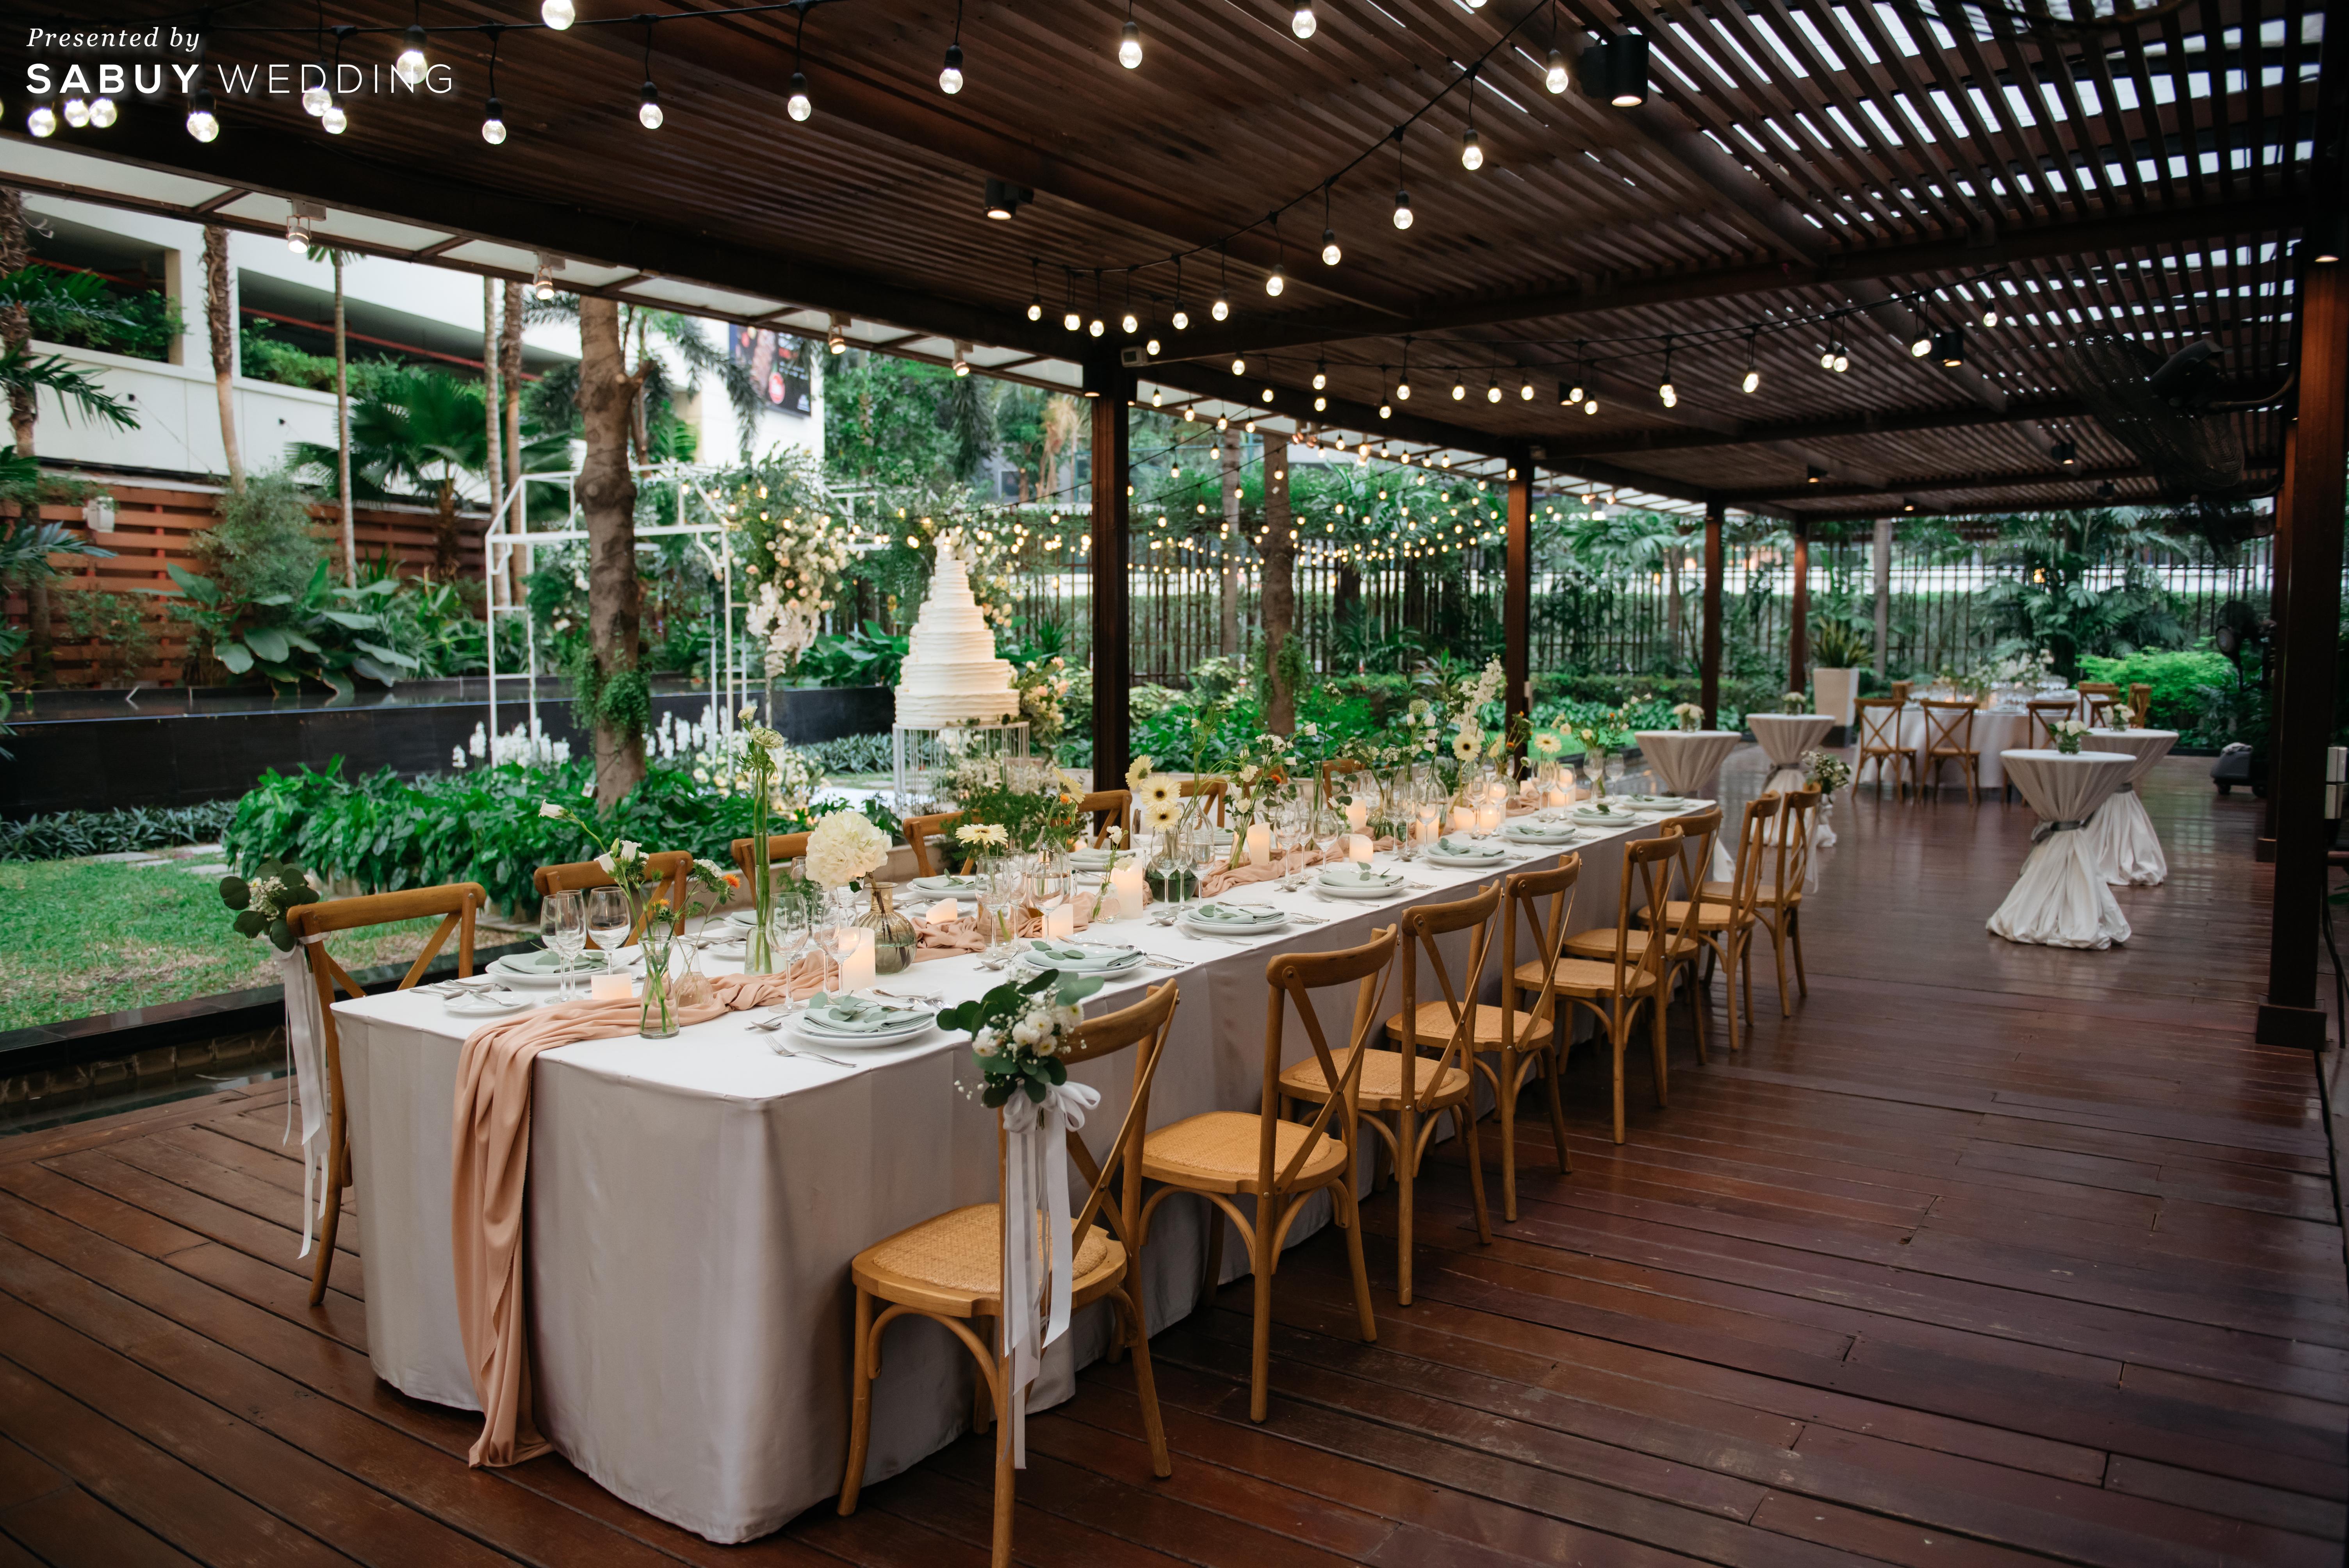 MARRIOTT EXECUTIVE APARTMENTS SUKHUMVIT PARK,Marriott Wedding Thailand,แมริออท ประเทศไทย,สถานที่แต่งงาน,สถานที่จัดงานแต่งงาน,โรงแรม,งานแต่งงาน,งานเลี้ยง,งานแต่งในสวน,งานแต่ง outdoor ครบทุกความต้องการของบ่าวสาว กับ 40 สถานที่แต่งงานในเครือ Marriott